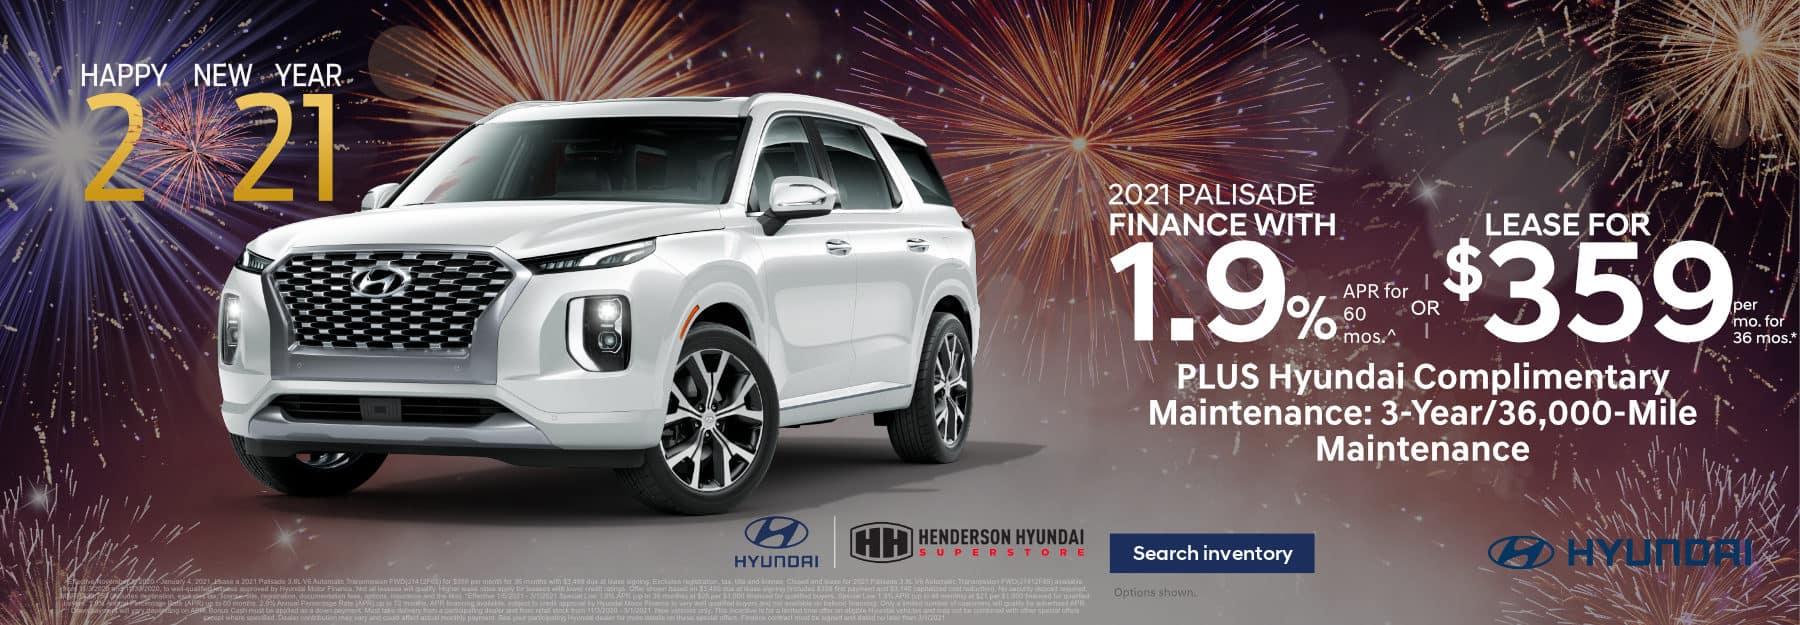 January_2021_PALISADE_Henderson_Hyundai